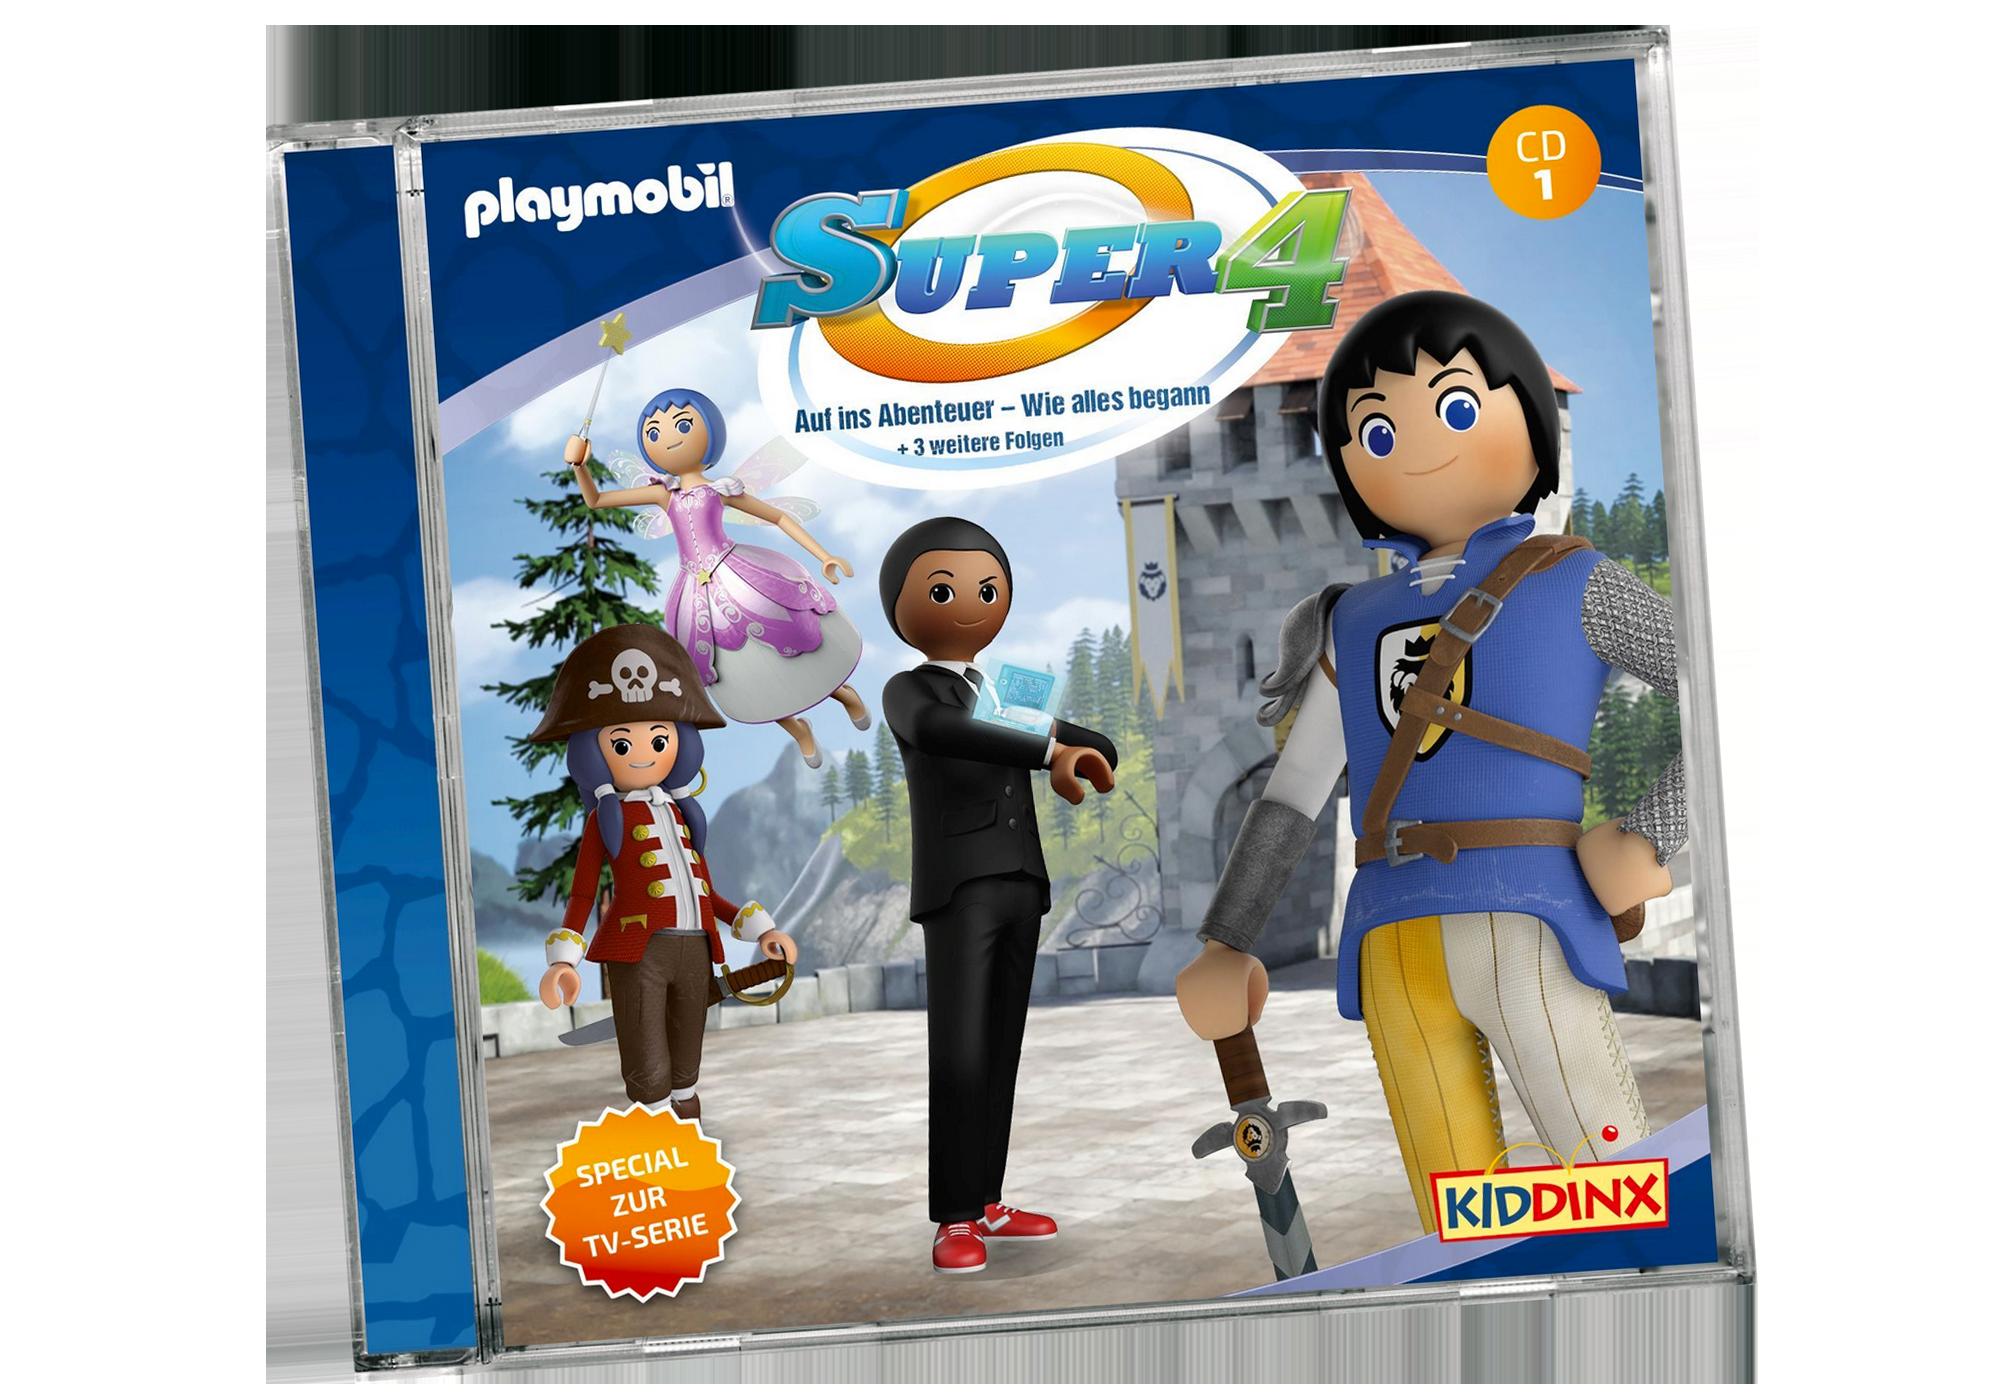 http://media.playmobil.com/i/playmobil/80474_product_detail